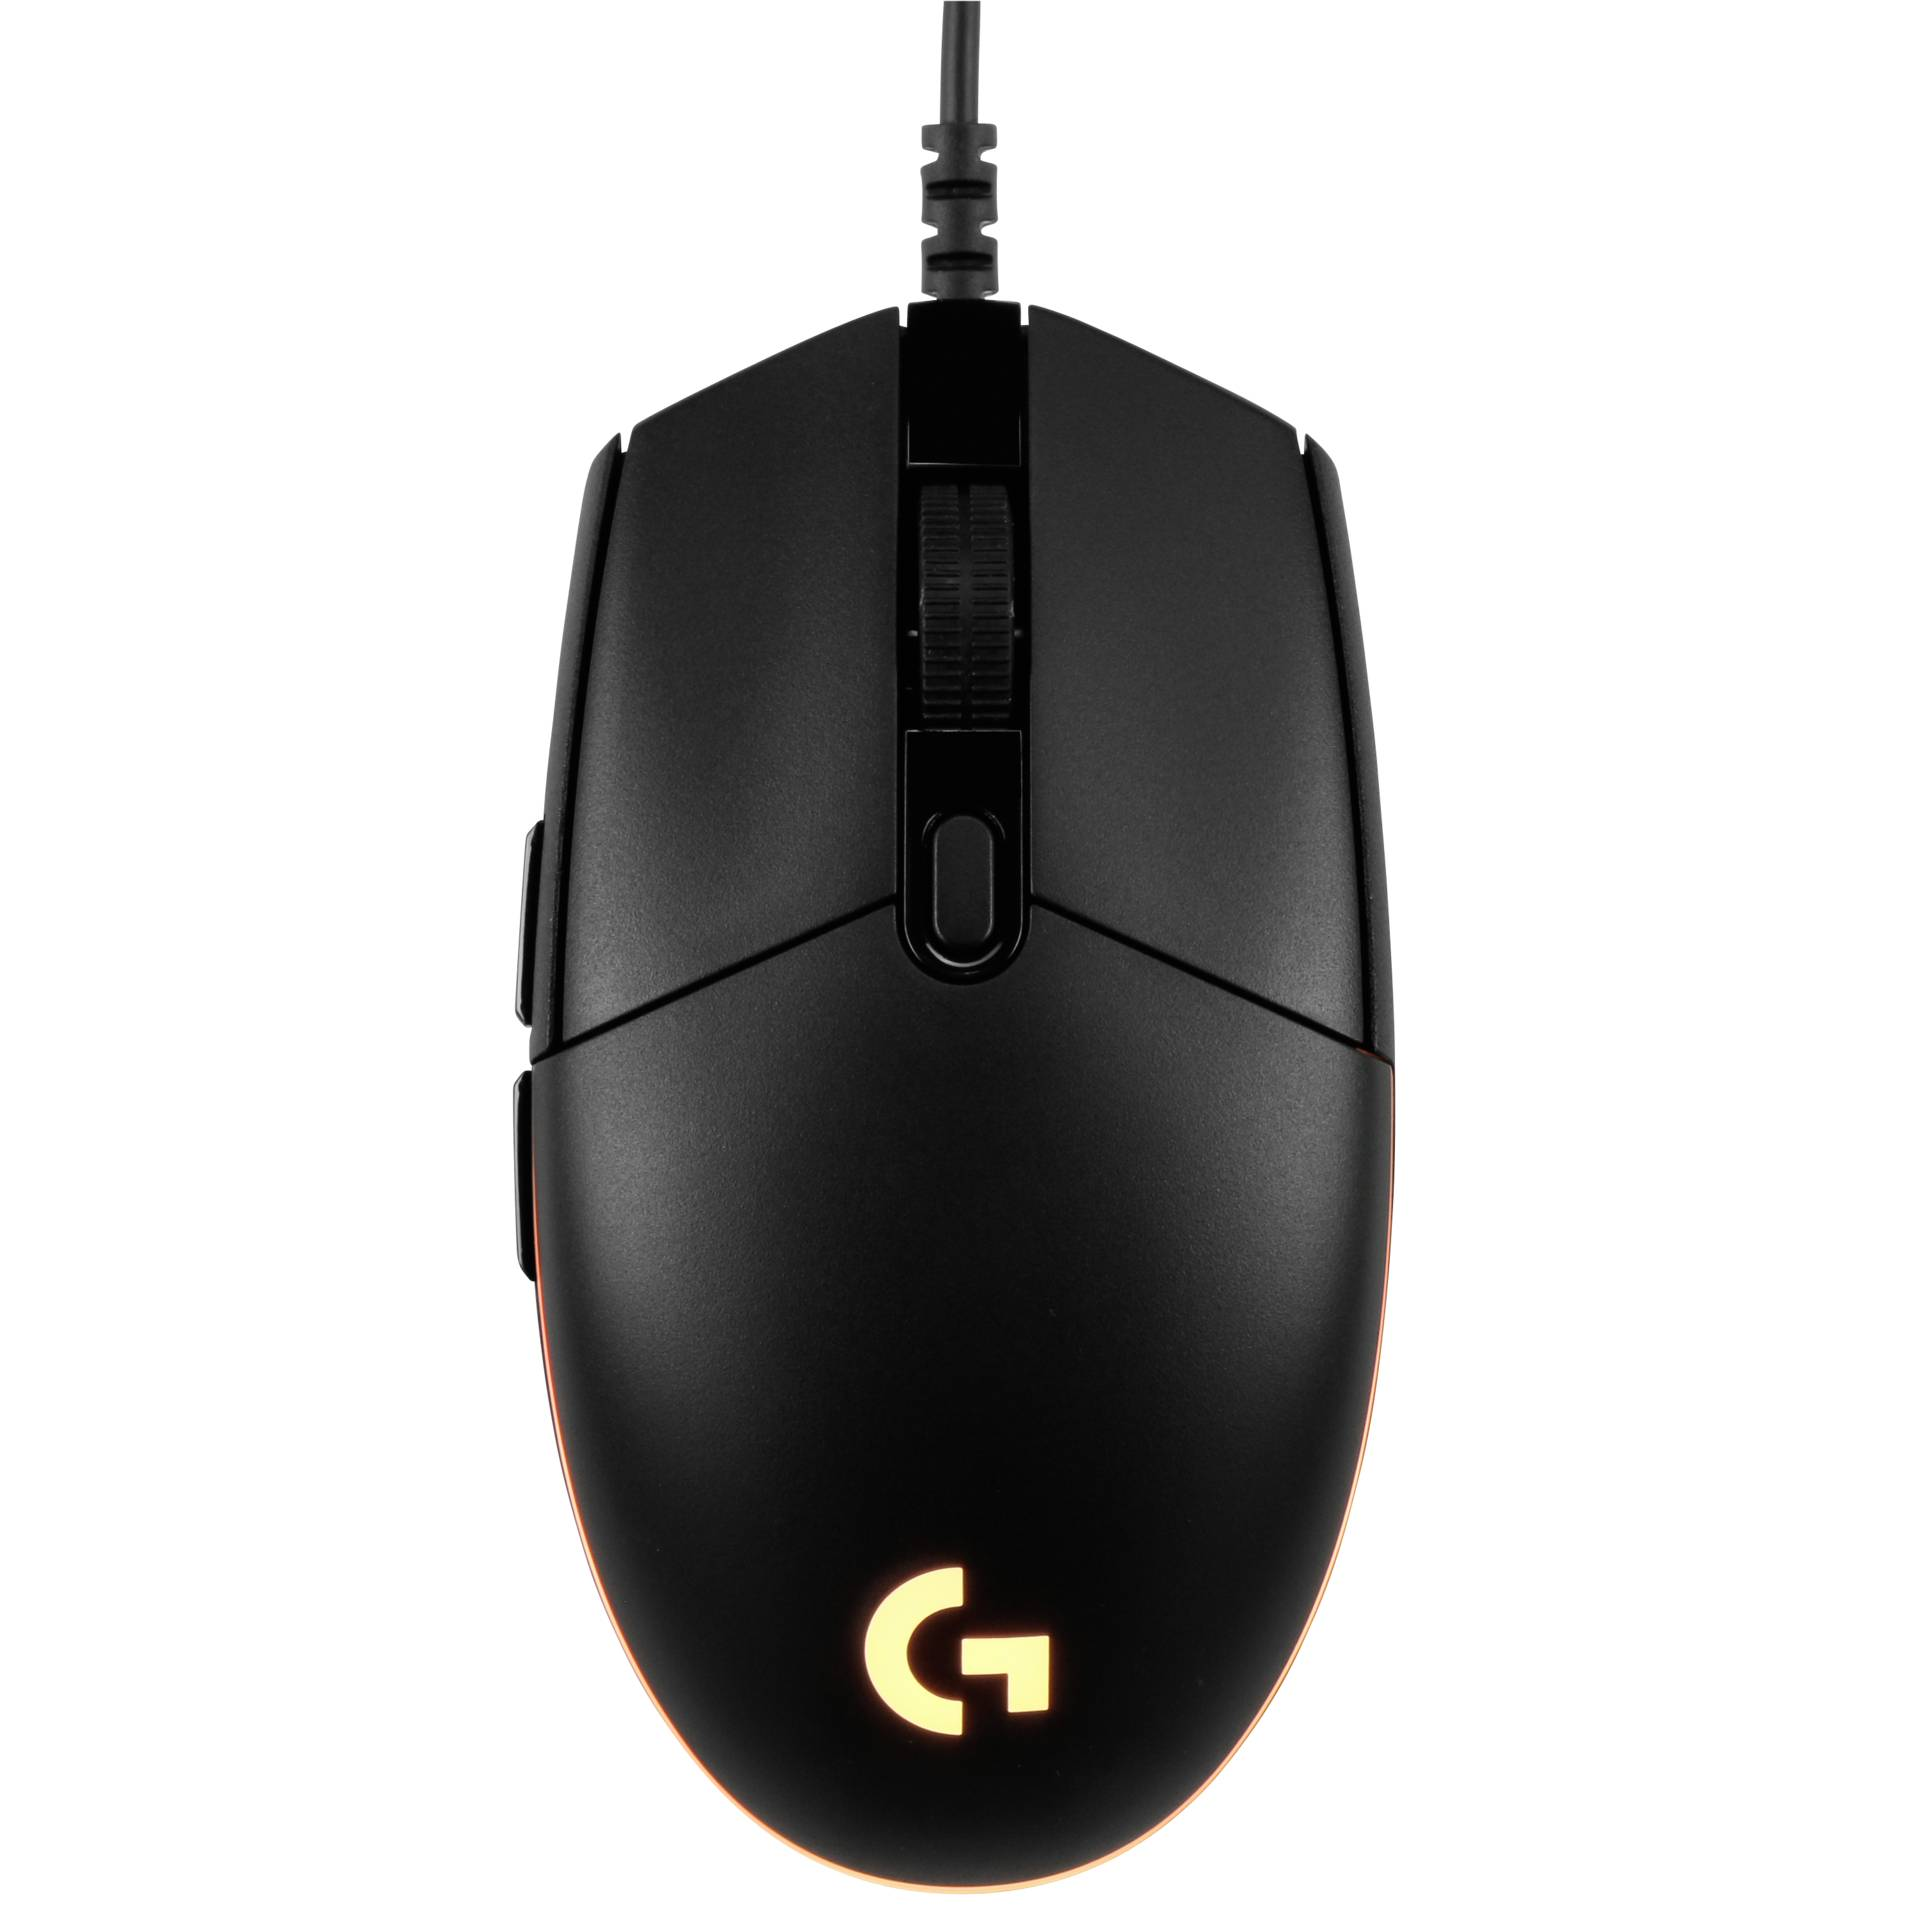 Logitech G203 black